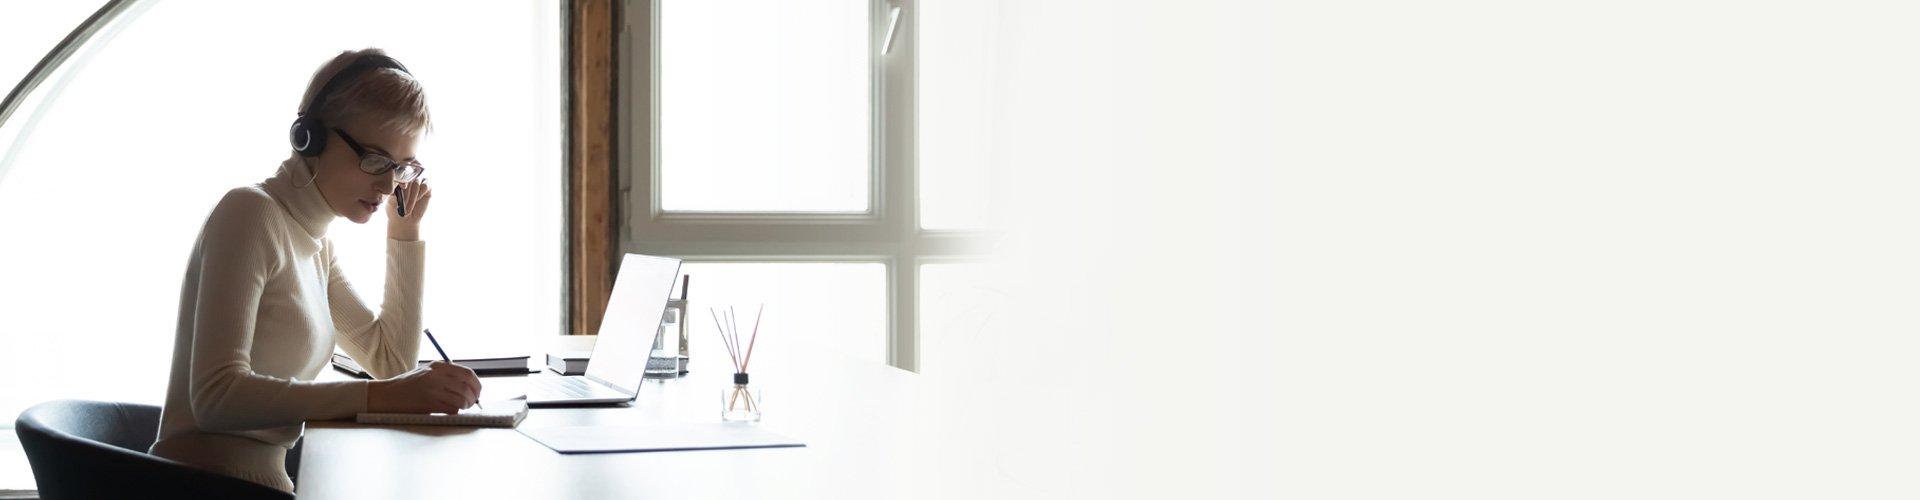 webinars-learning-banner-image-1920x500